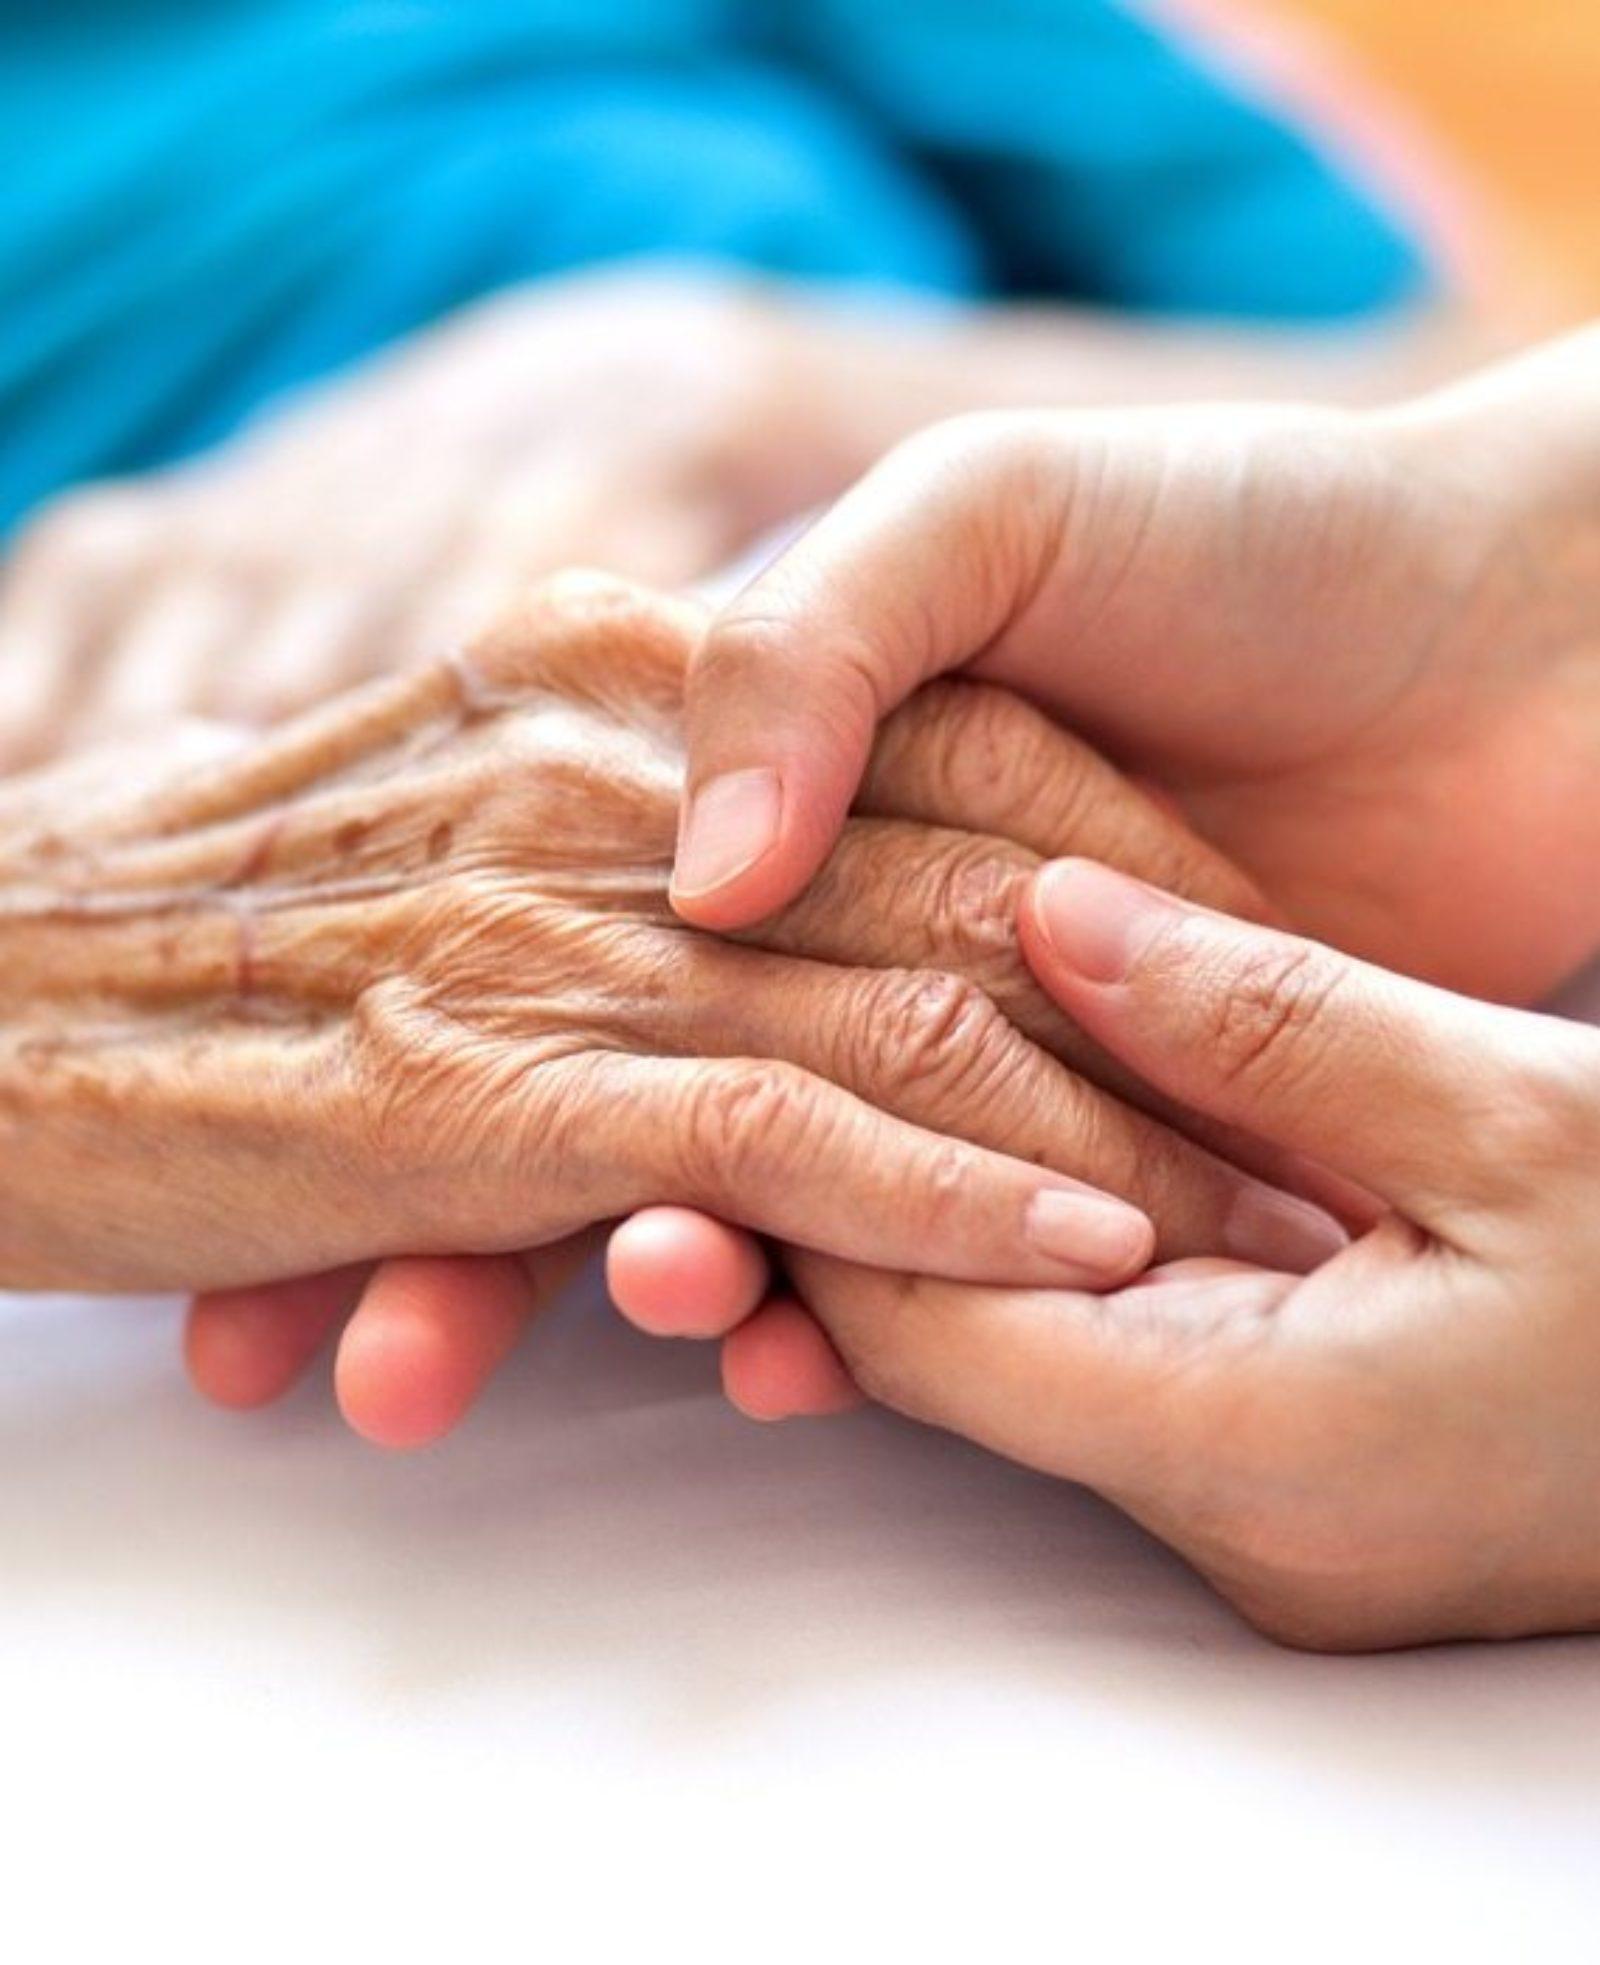 Bill C-14: Legislation for medical assistance in dying